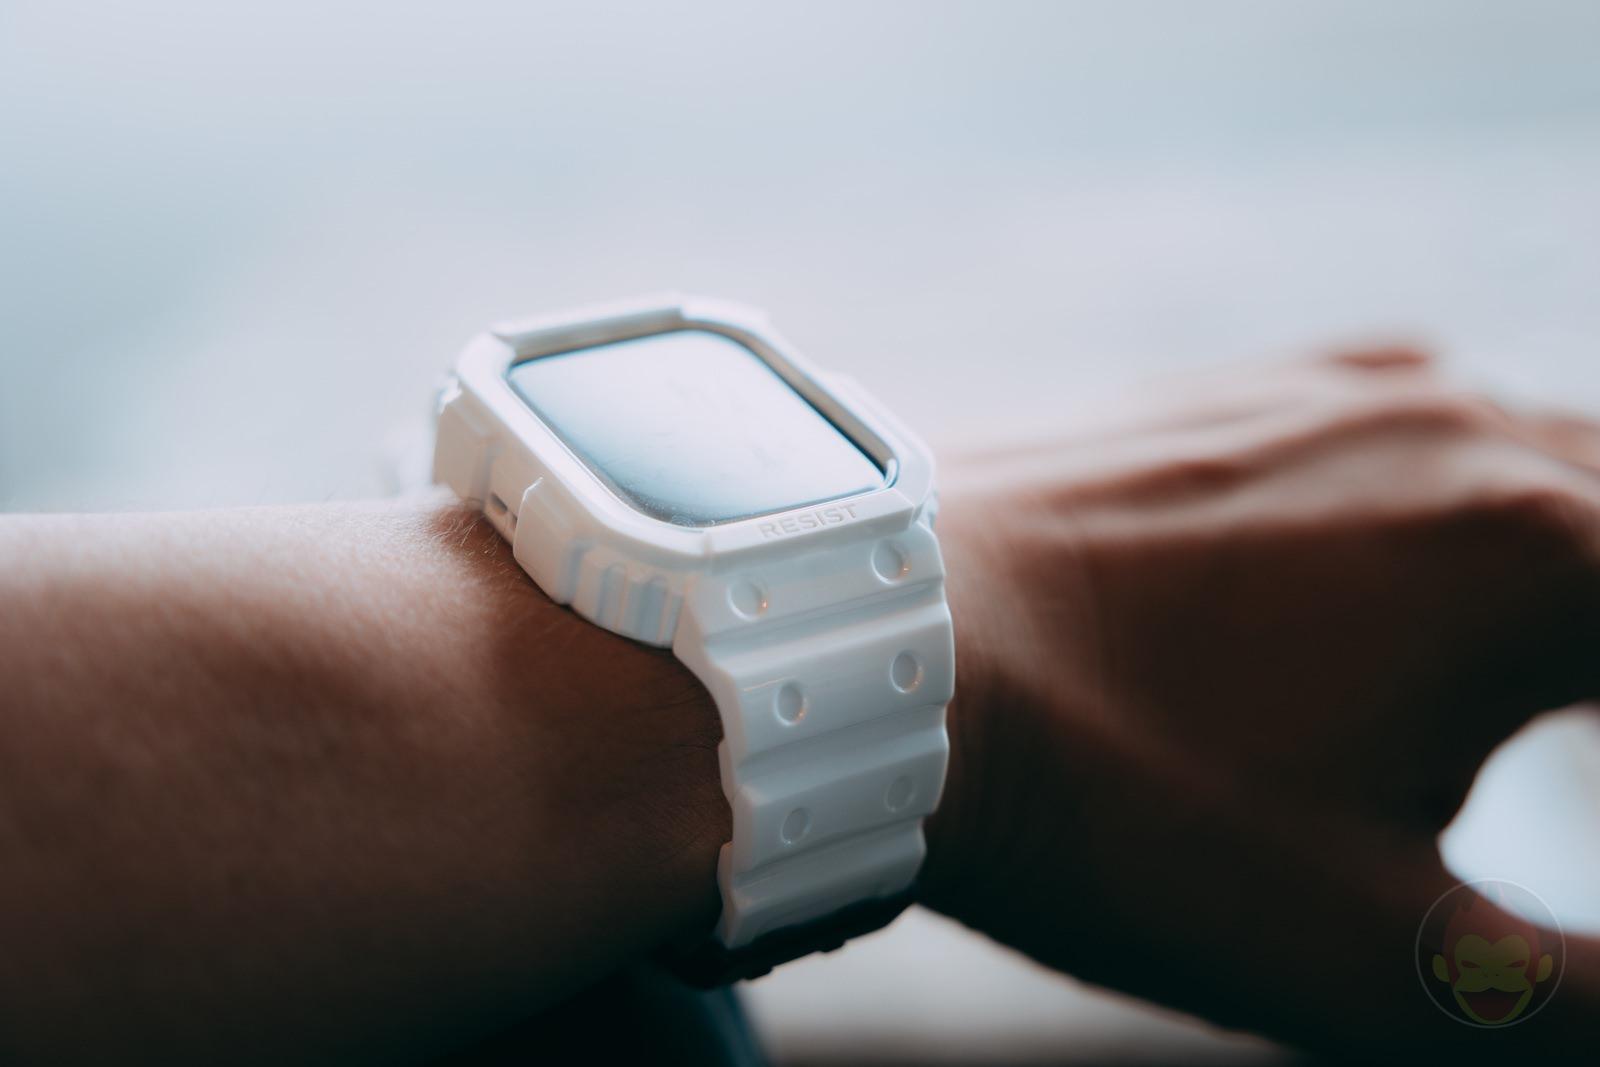 AmBand Apple Watch White G SHOCK Case 09